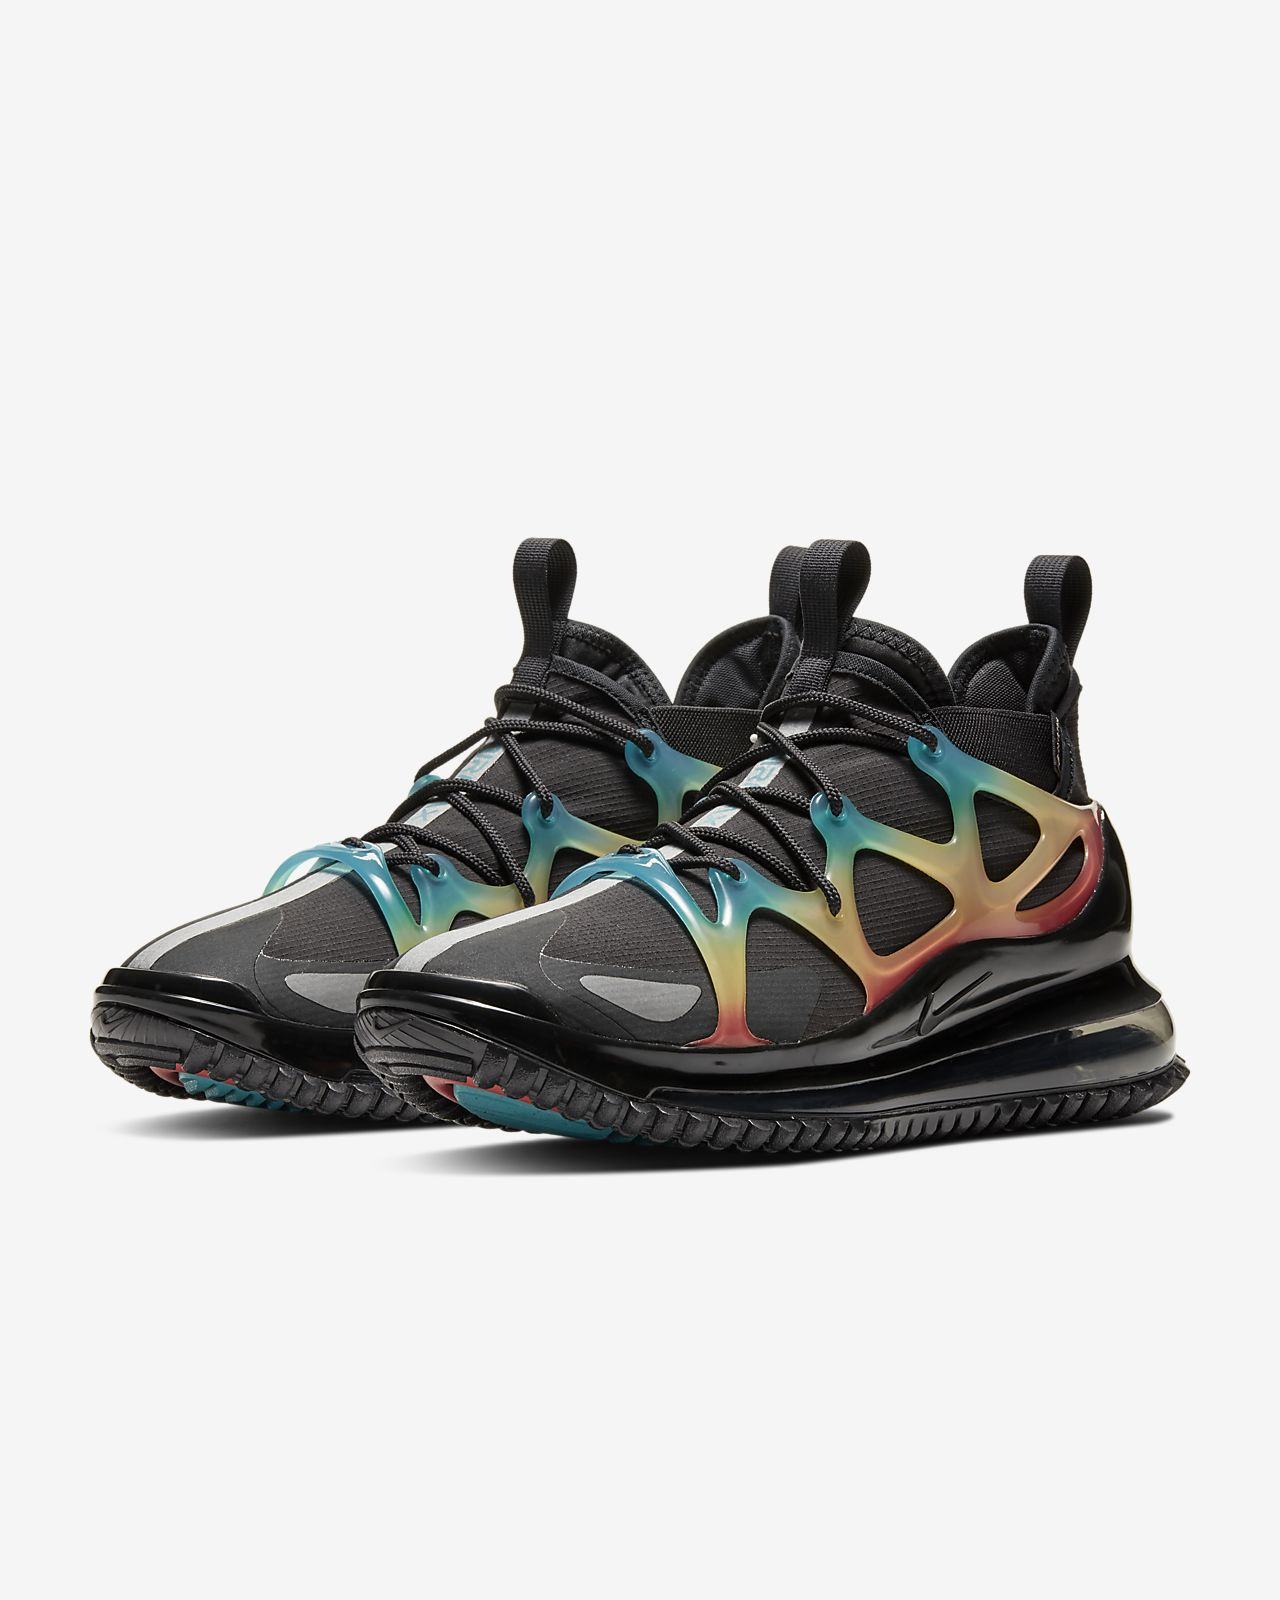 Chaussure Nike 720 Homme pour Air Max Horizon clFTK1J